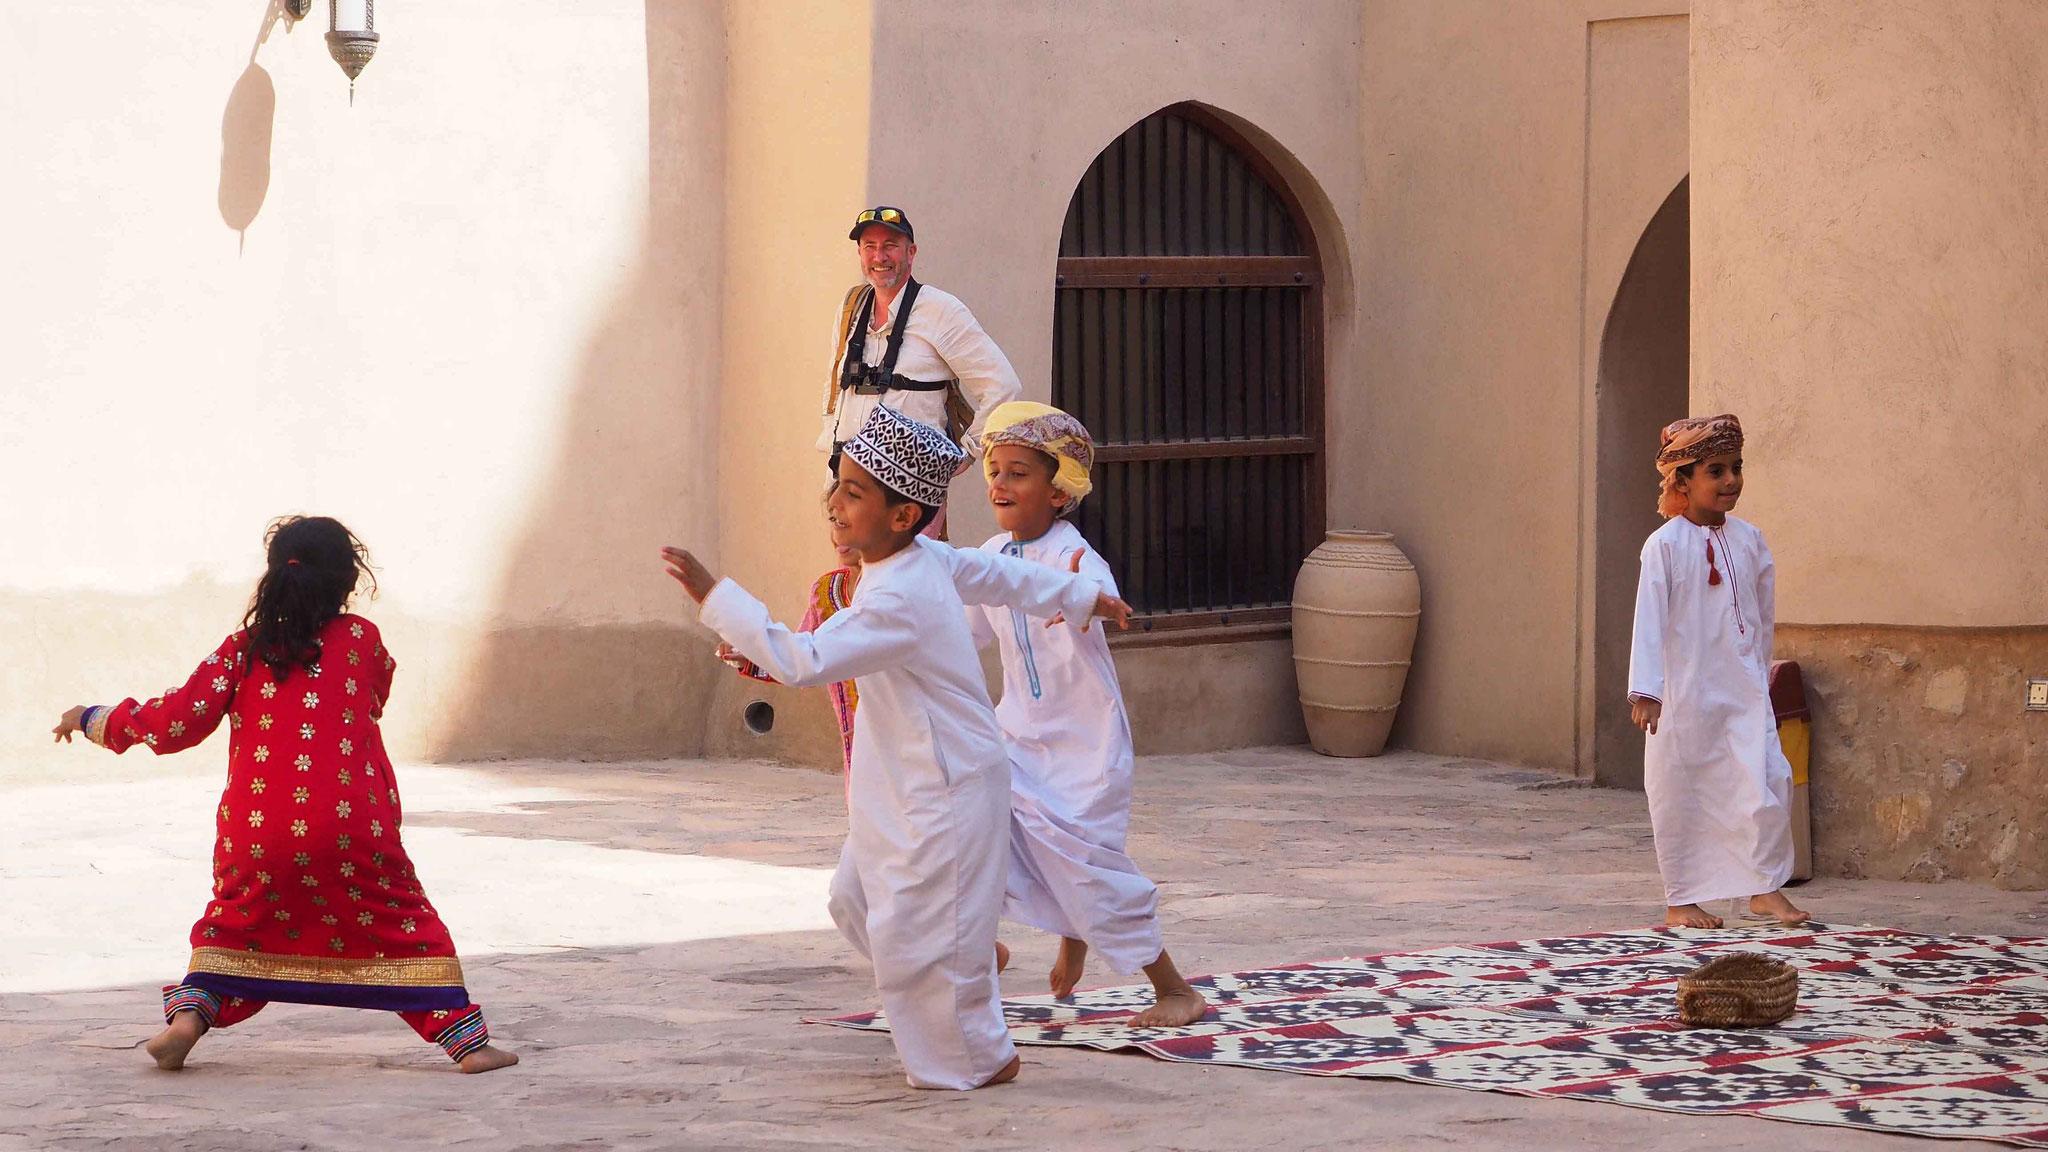 Enfants jouant à Nizwa - Oman